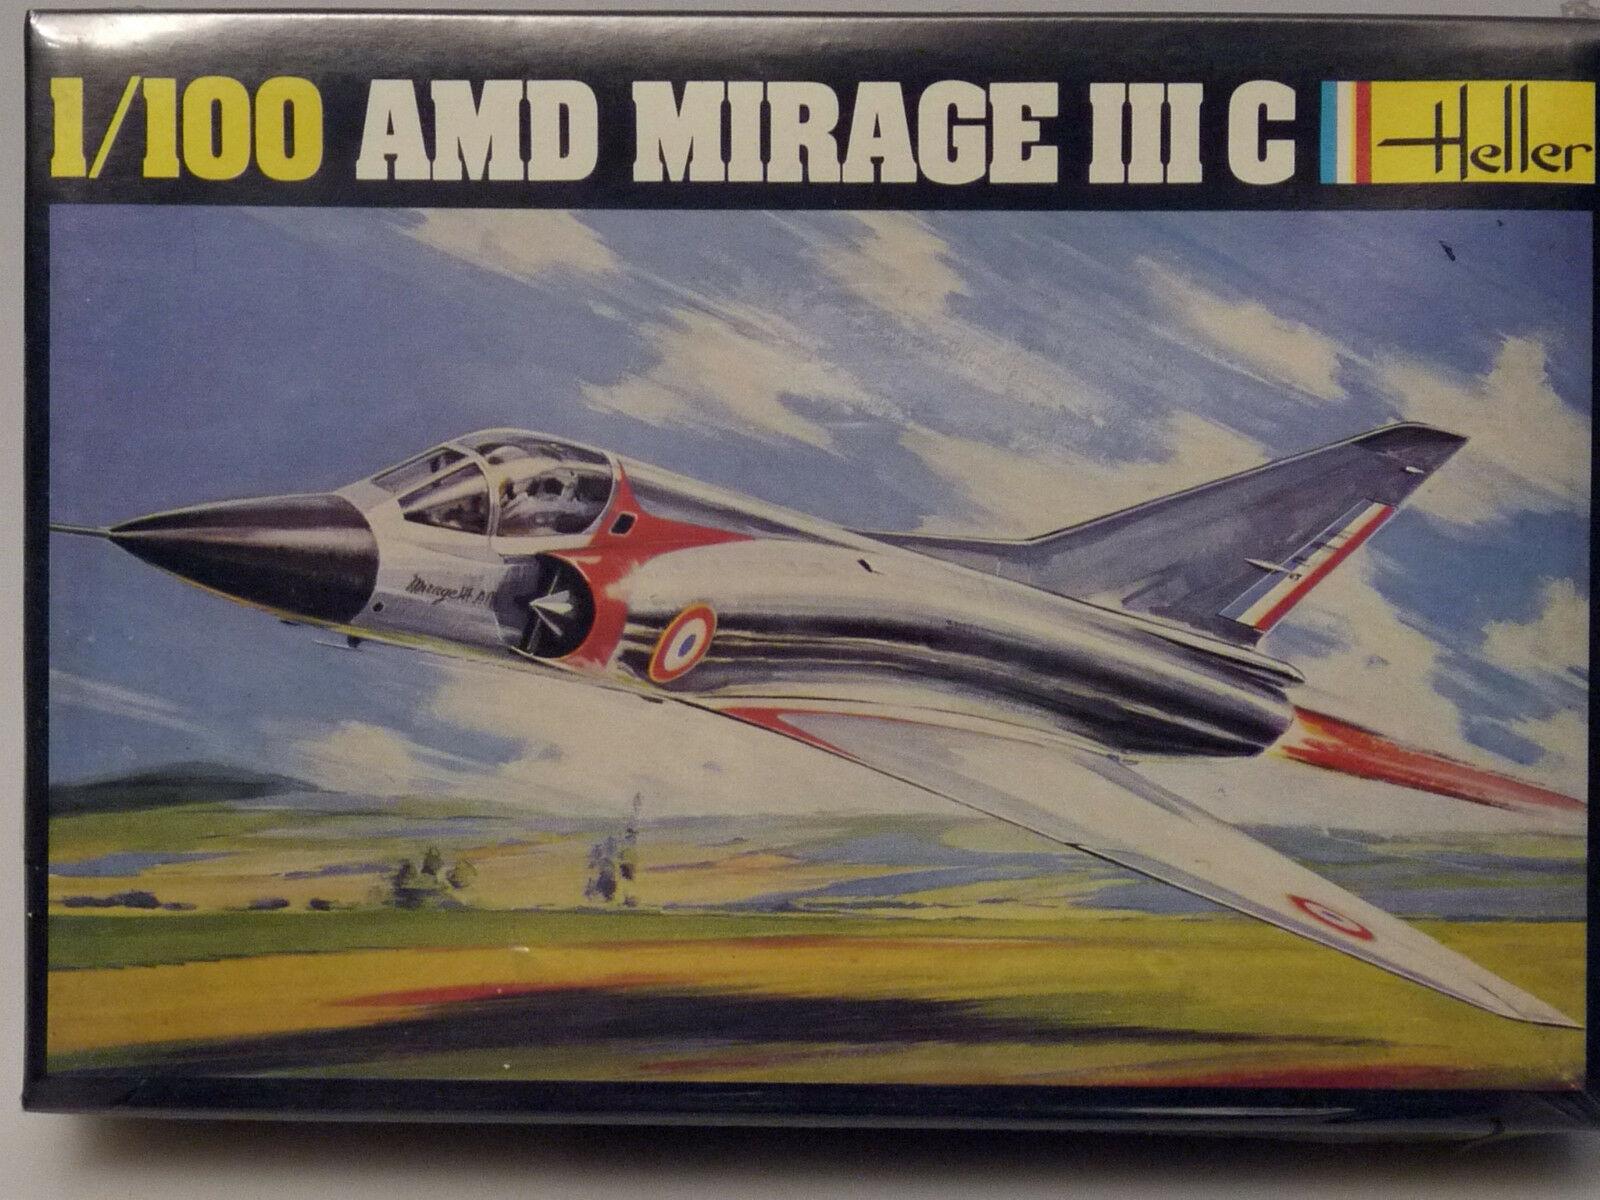 PRL) AMD MIRAGE III C JET MONTAGGIO MODELLINO MODEL 1 100 PLANE AVION HELLER